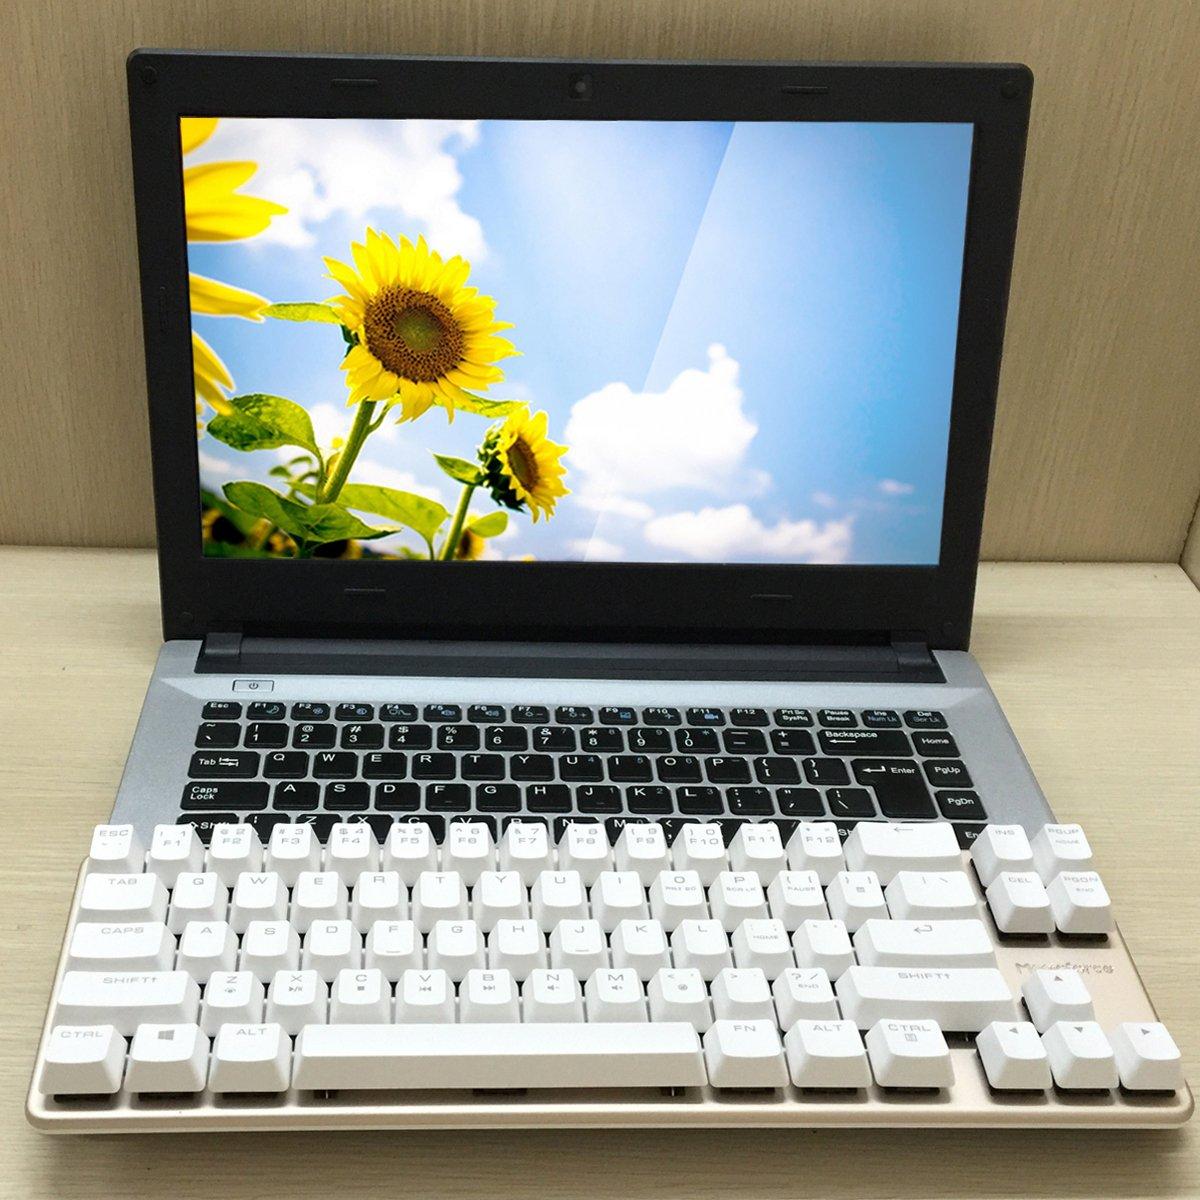 mechanical keyboard wired keyboard blue switch 68 keys mini design 60 gaming 696397872469 ebay. Black Bedroom Furniture Sets. Home Design Ideas